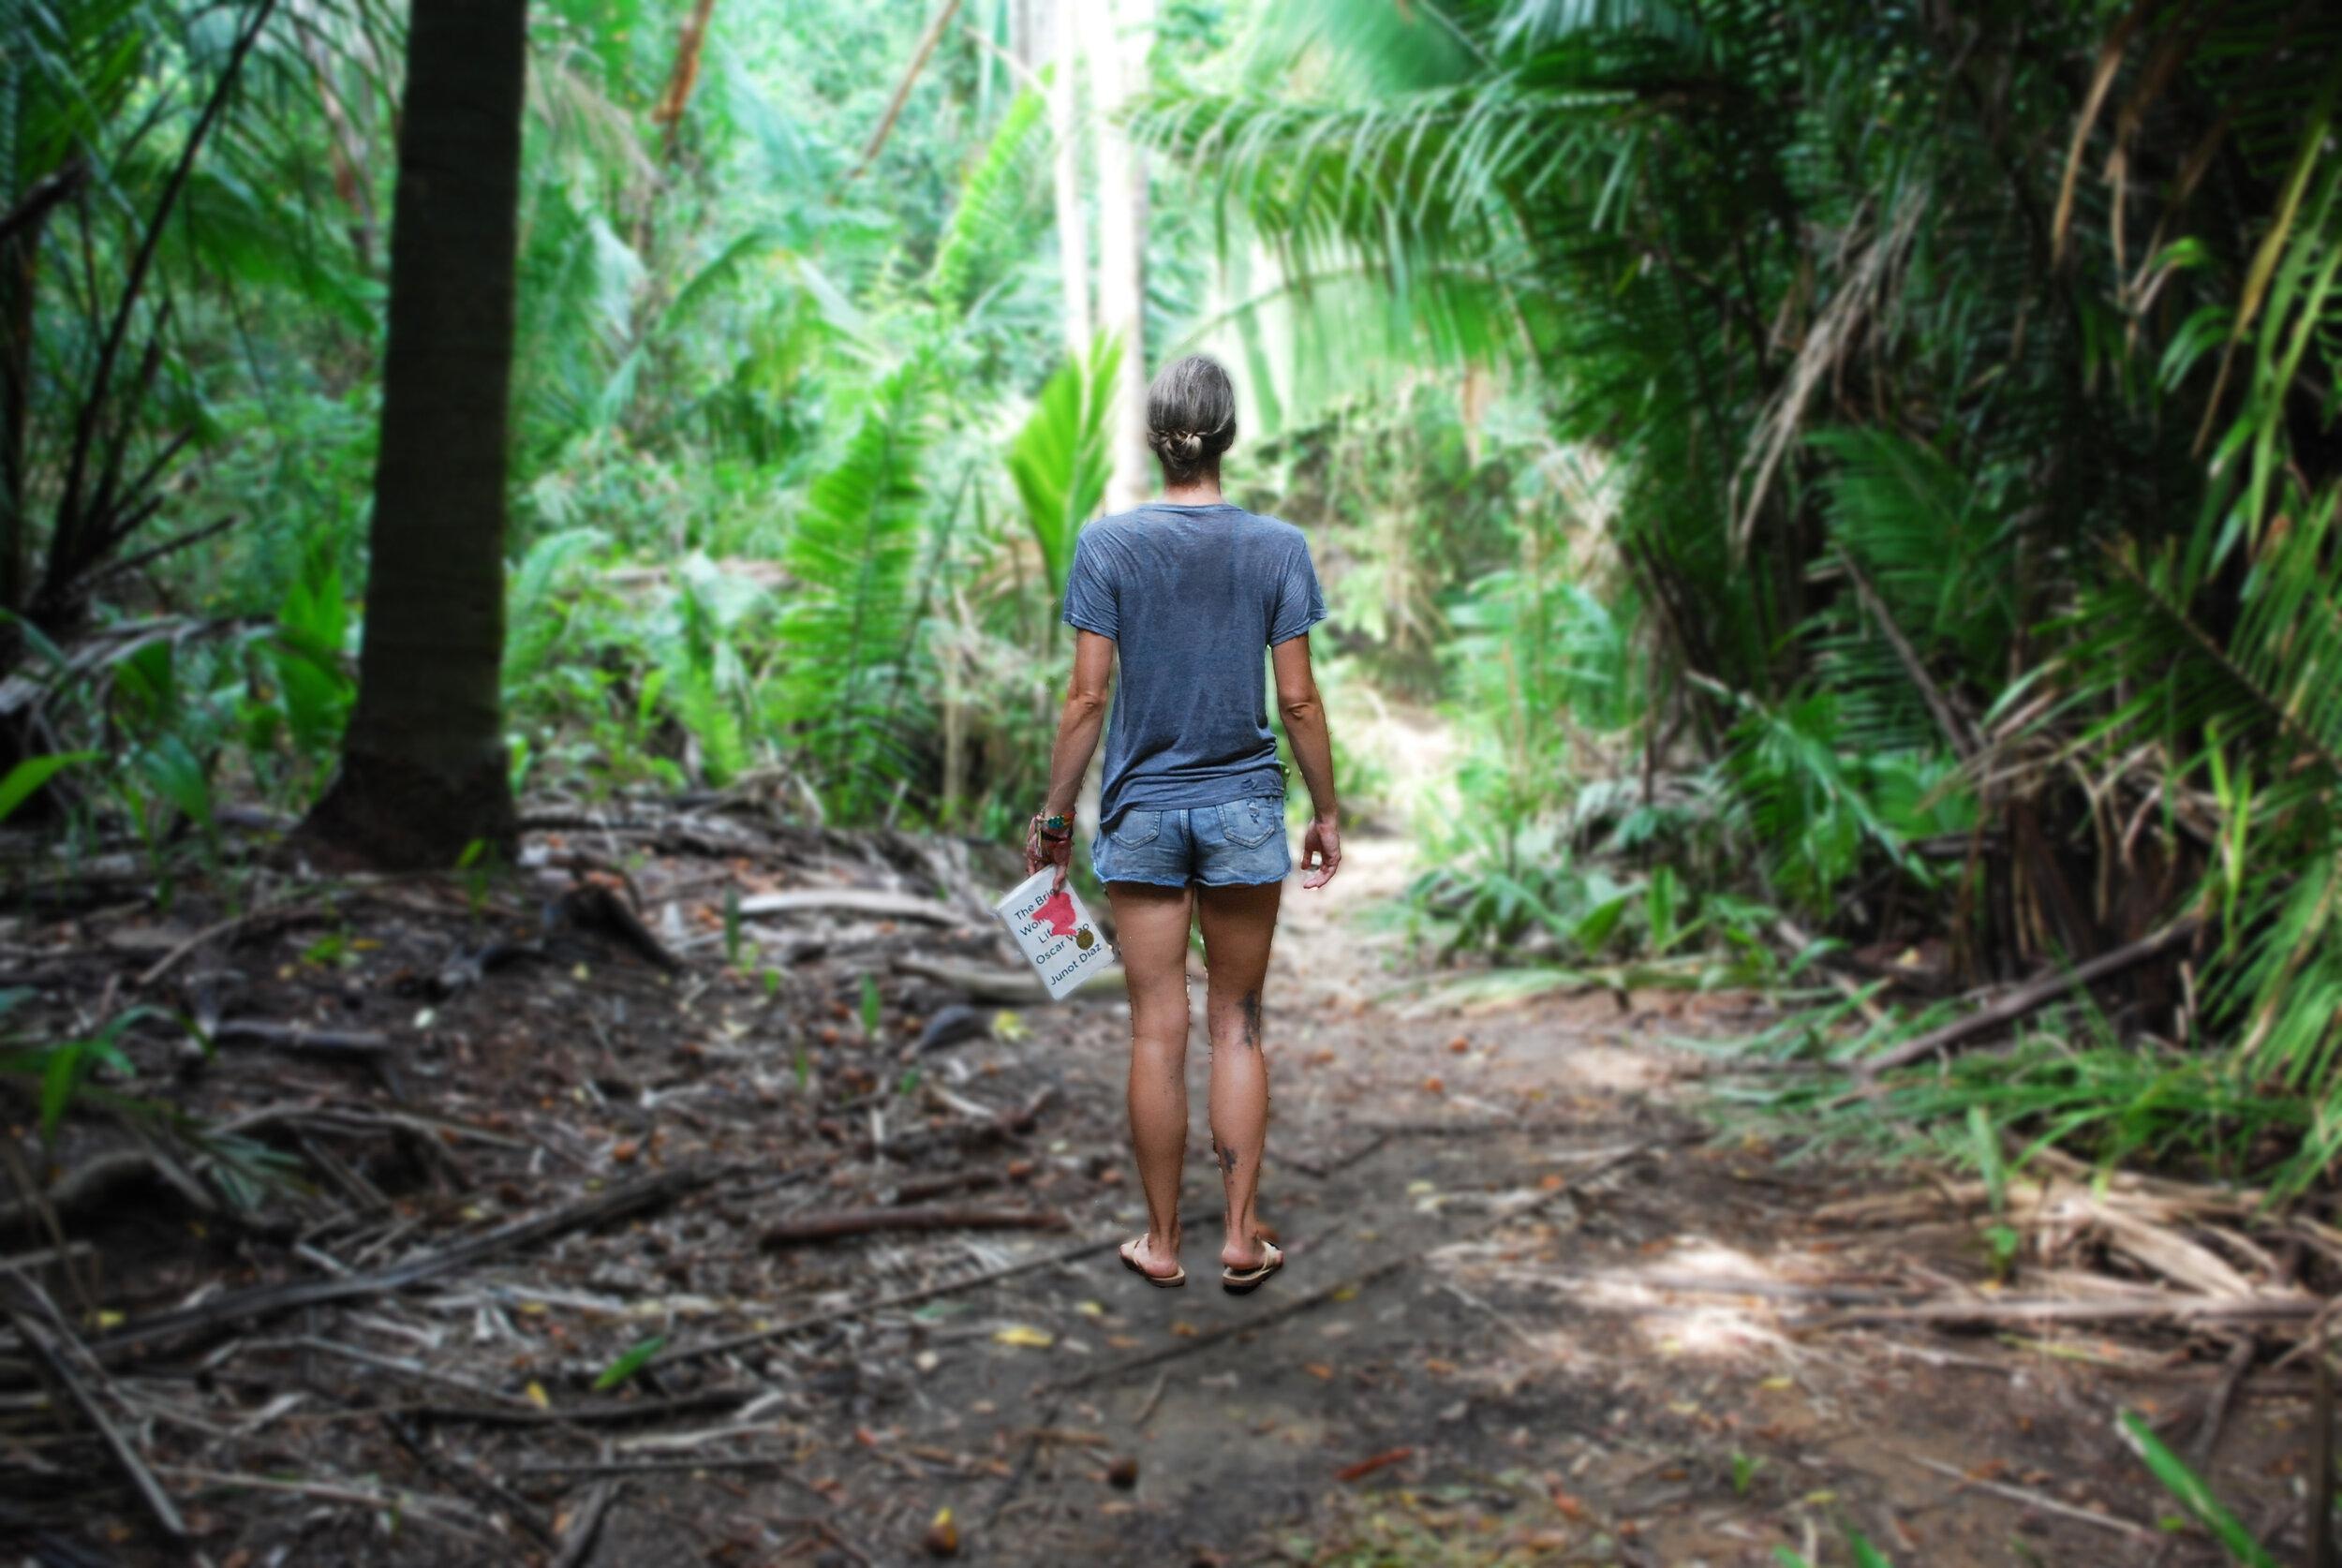 Jungle1website_edit1.jpg